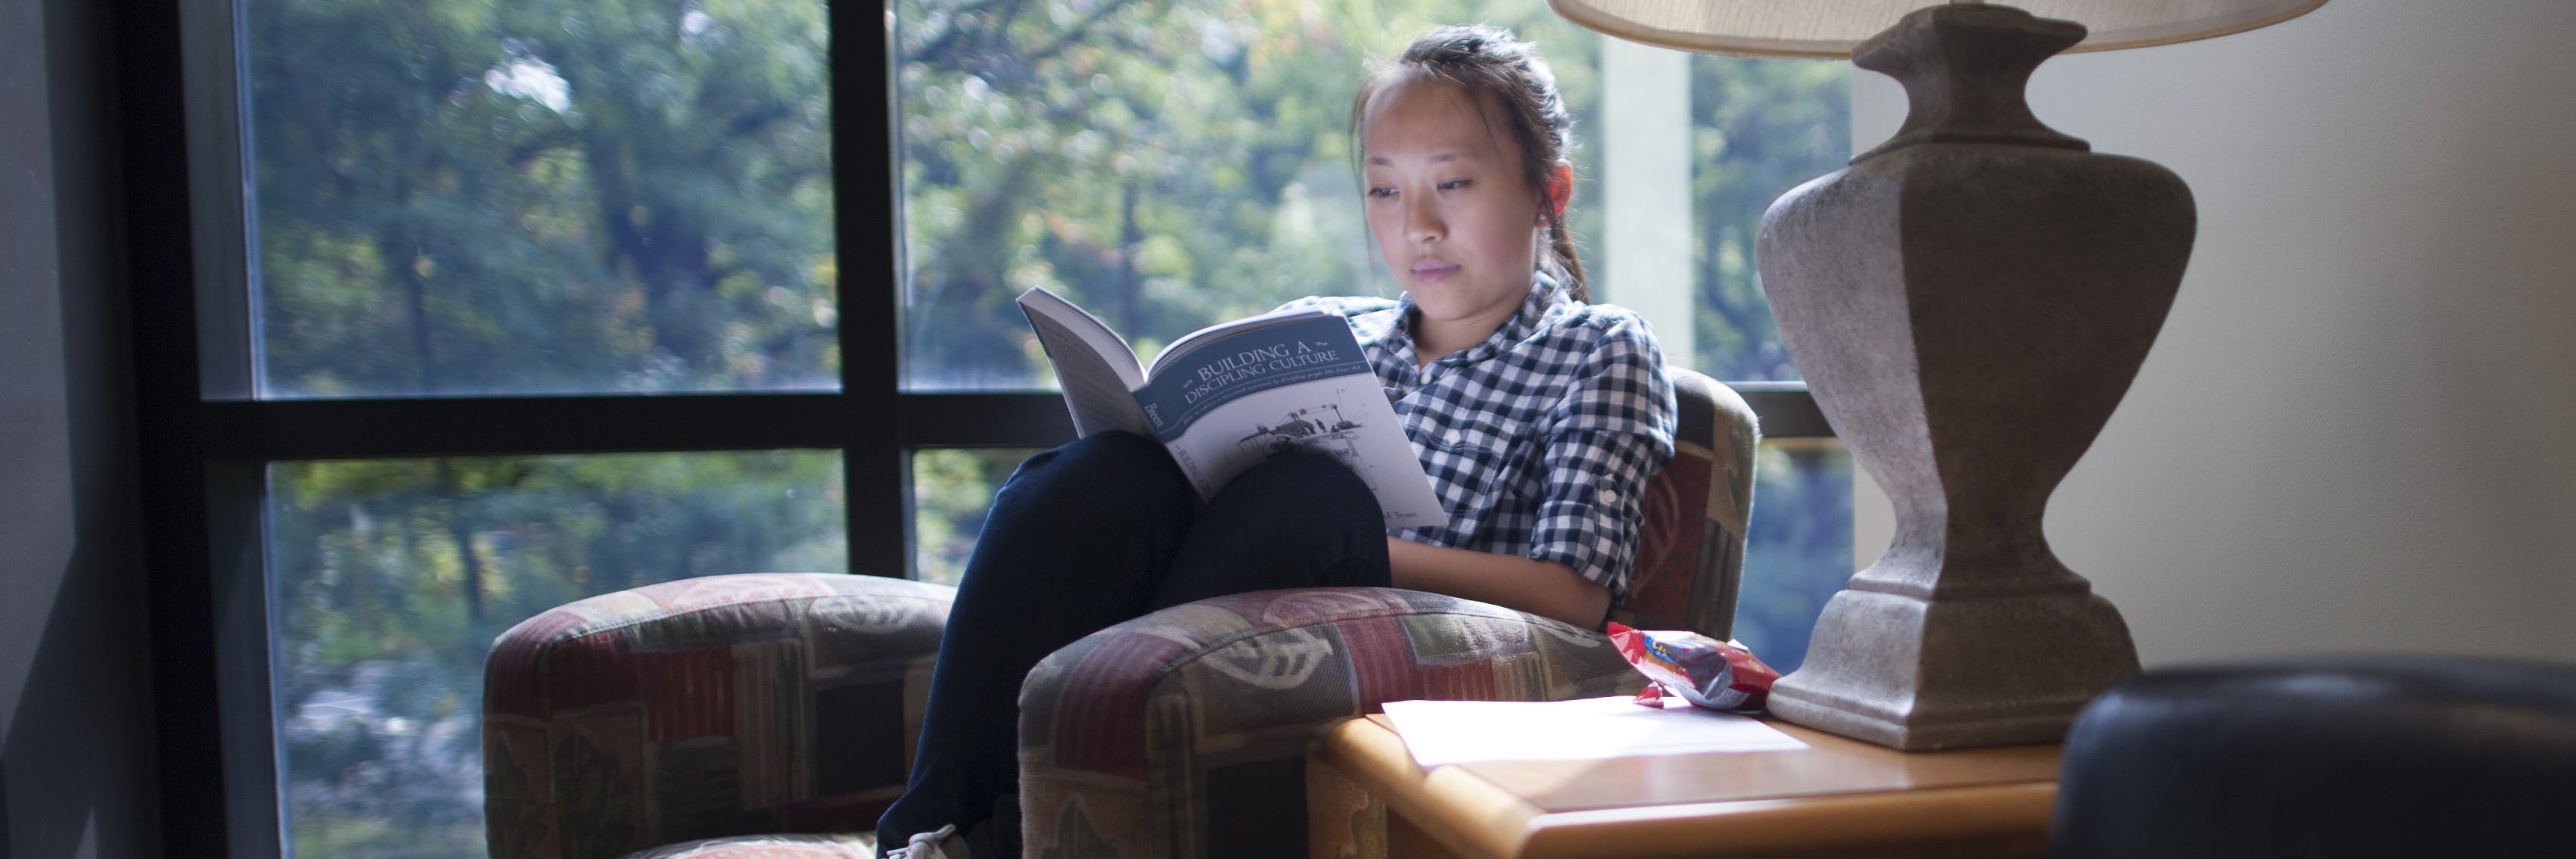 Student reading near a window